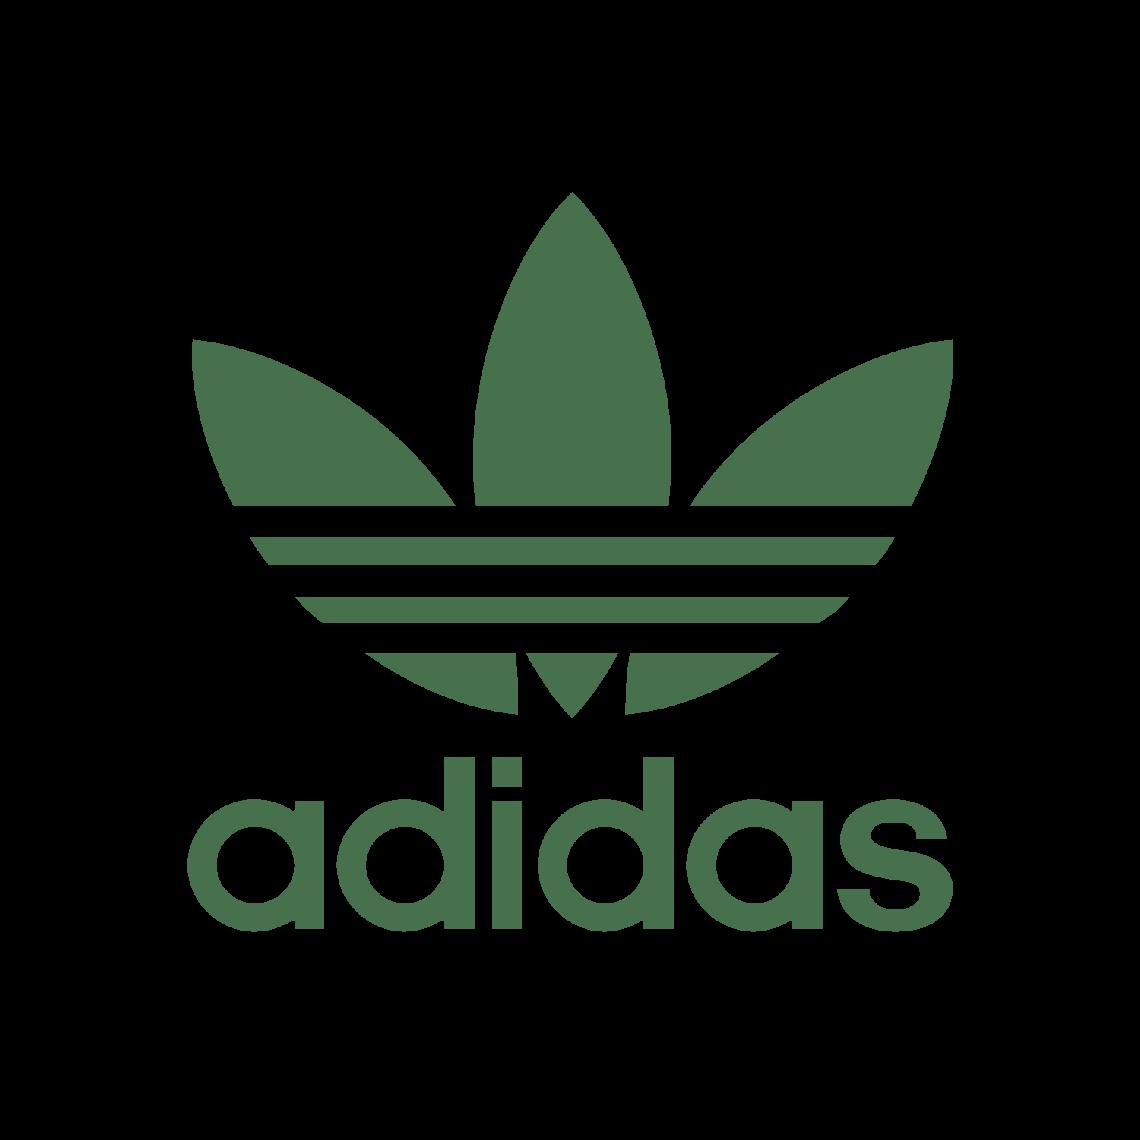 Adidas Slogan 5